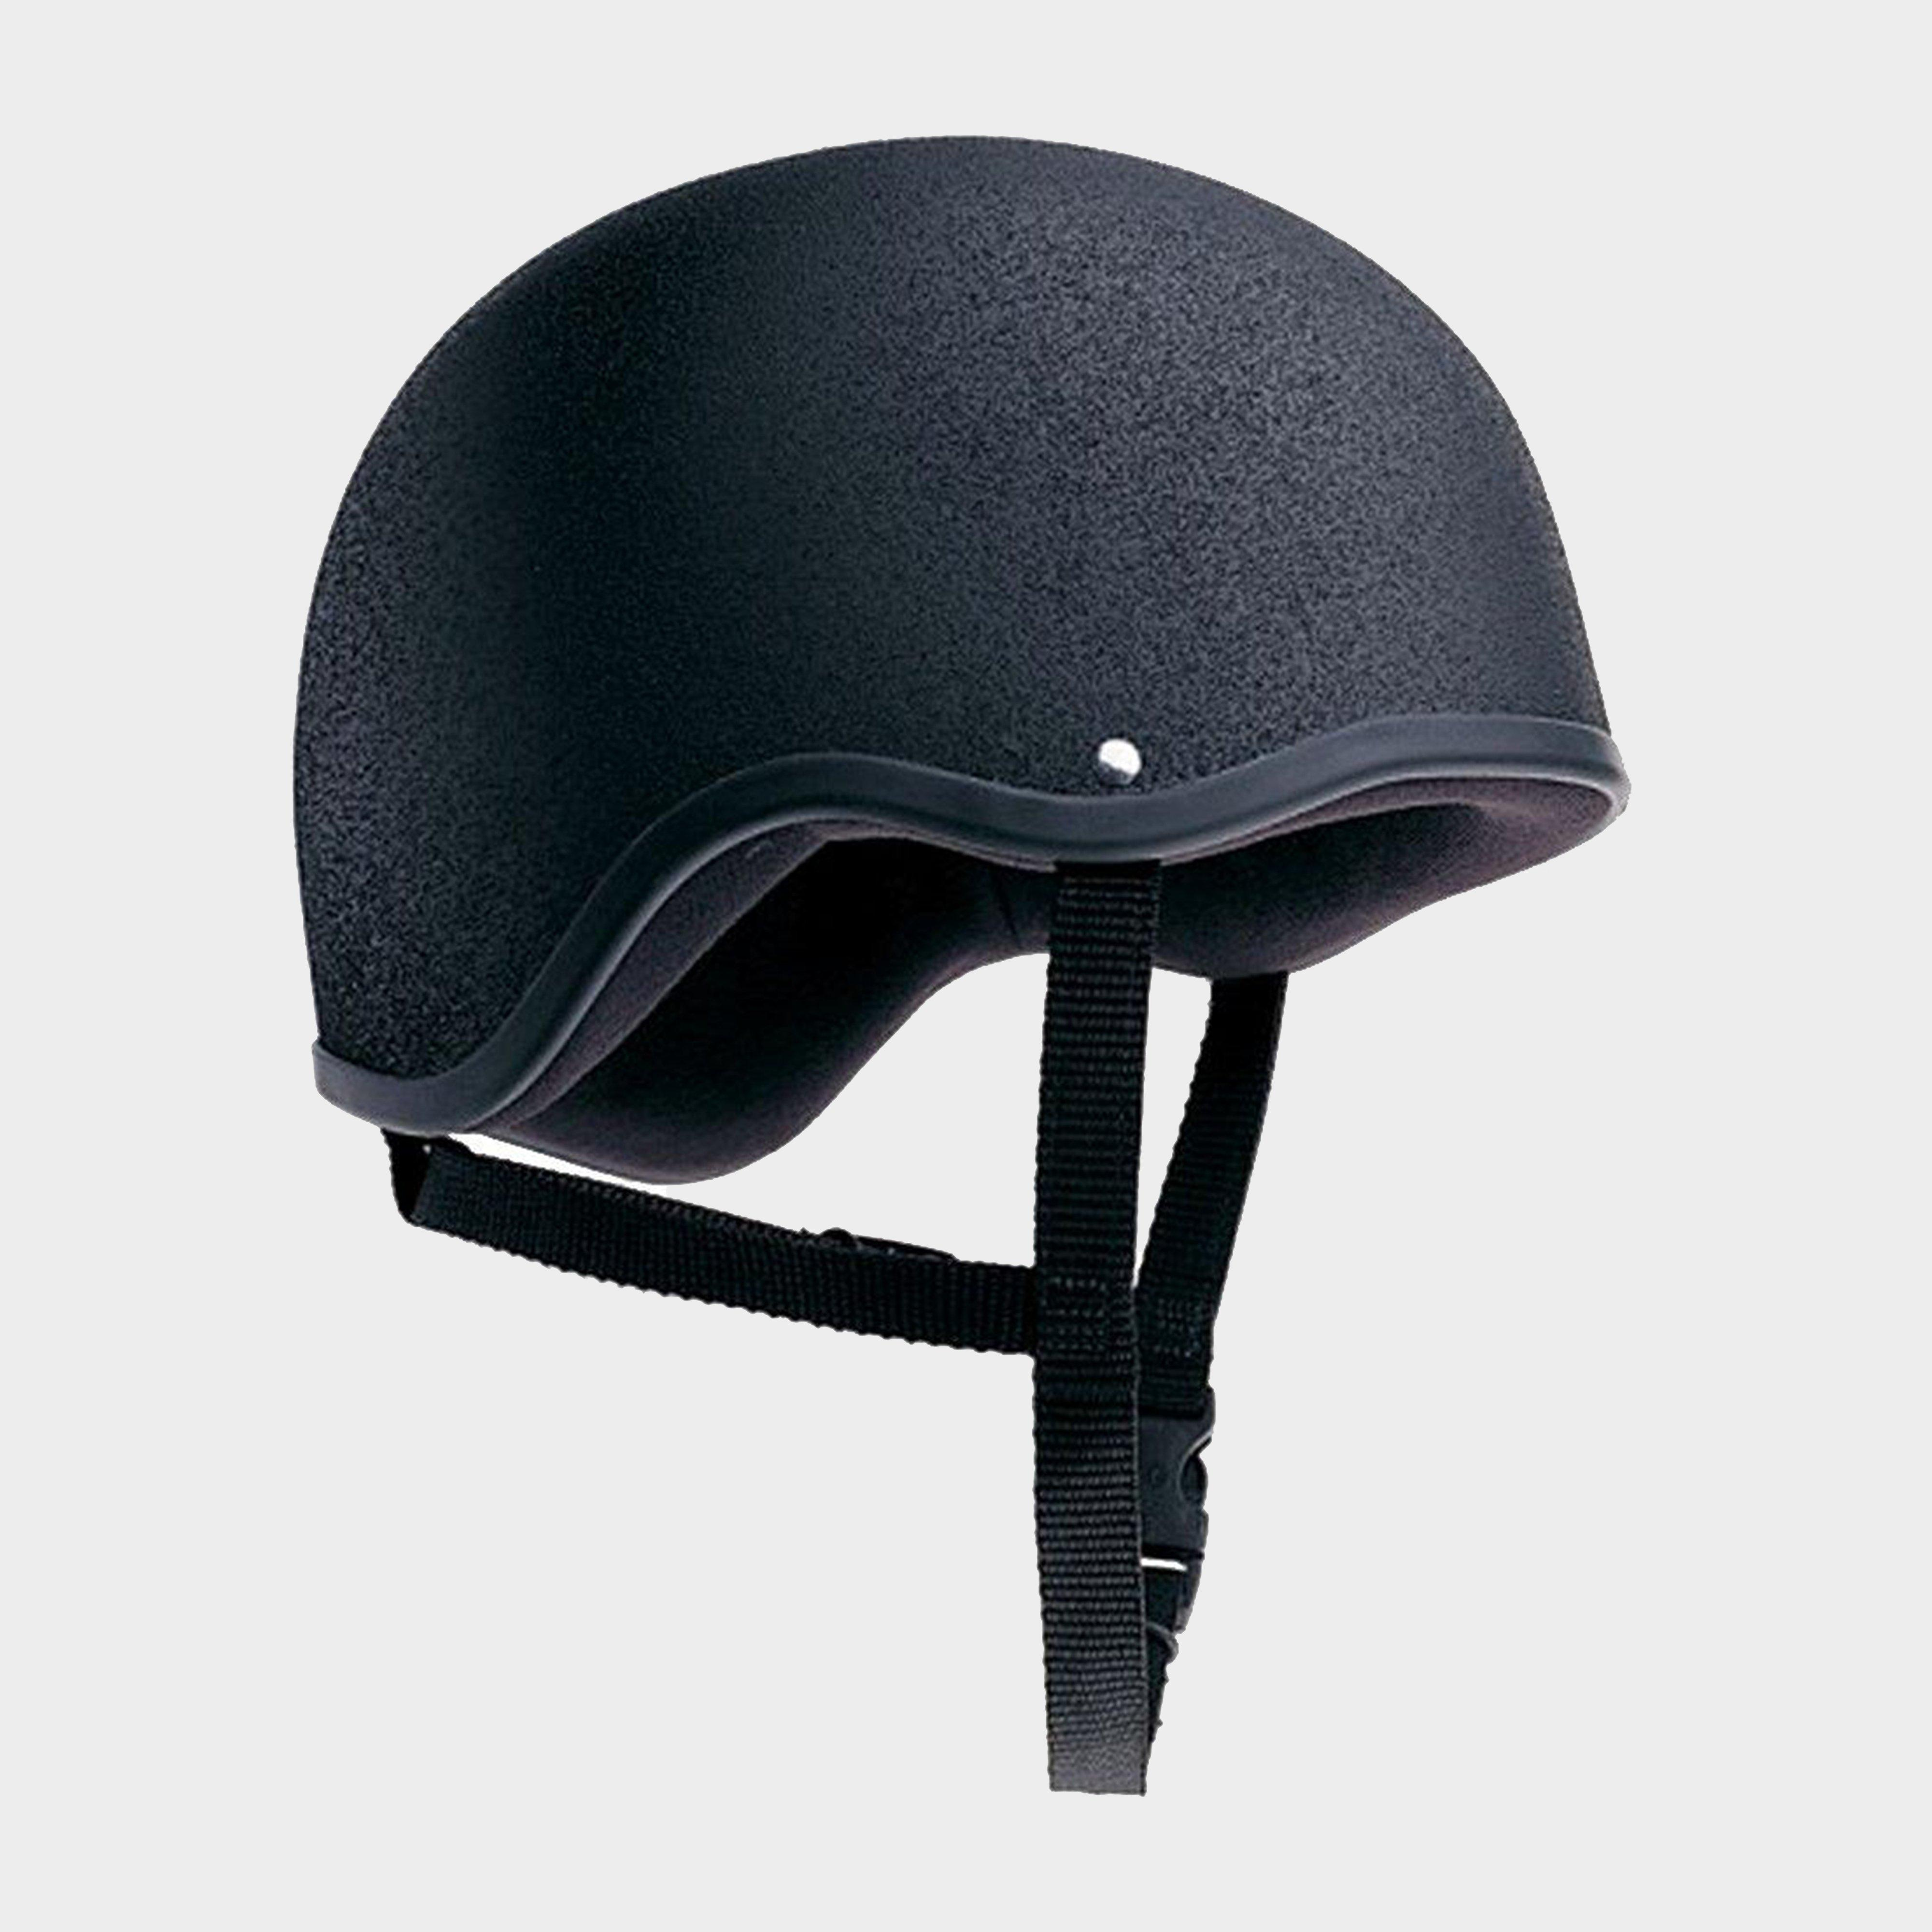 Champion Junior Plus Riding Helmet - Navy/navy  Navy/navy